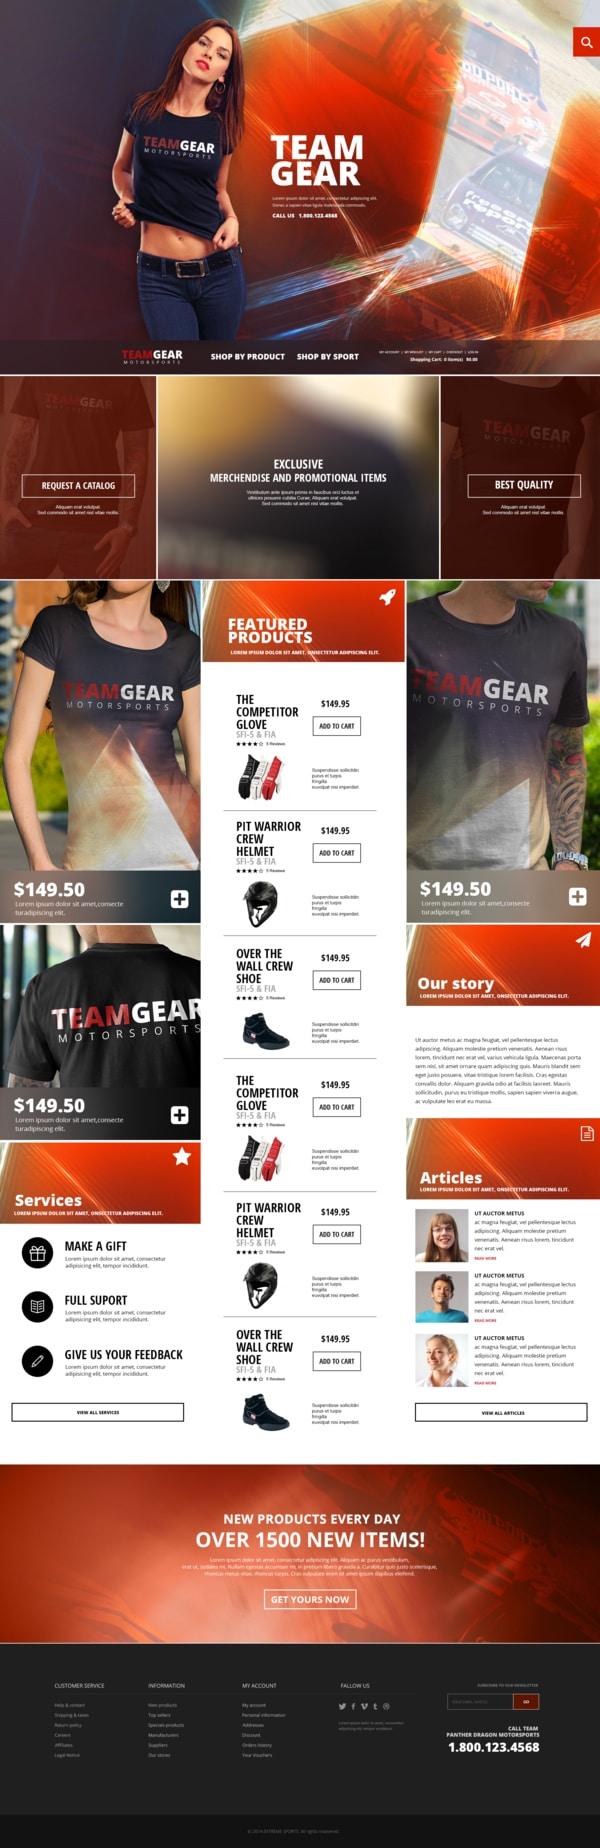 Team Gear - Online shop template Бесплатные шаблоны для интернет-магазина psd - Team Gear Online shop template - Бесплатные шаблоны для интернет-магазина PSD